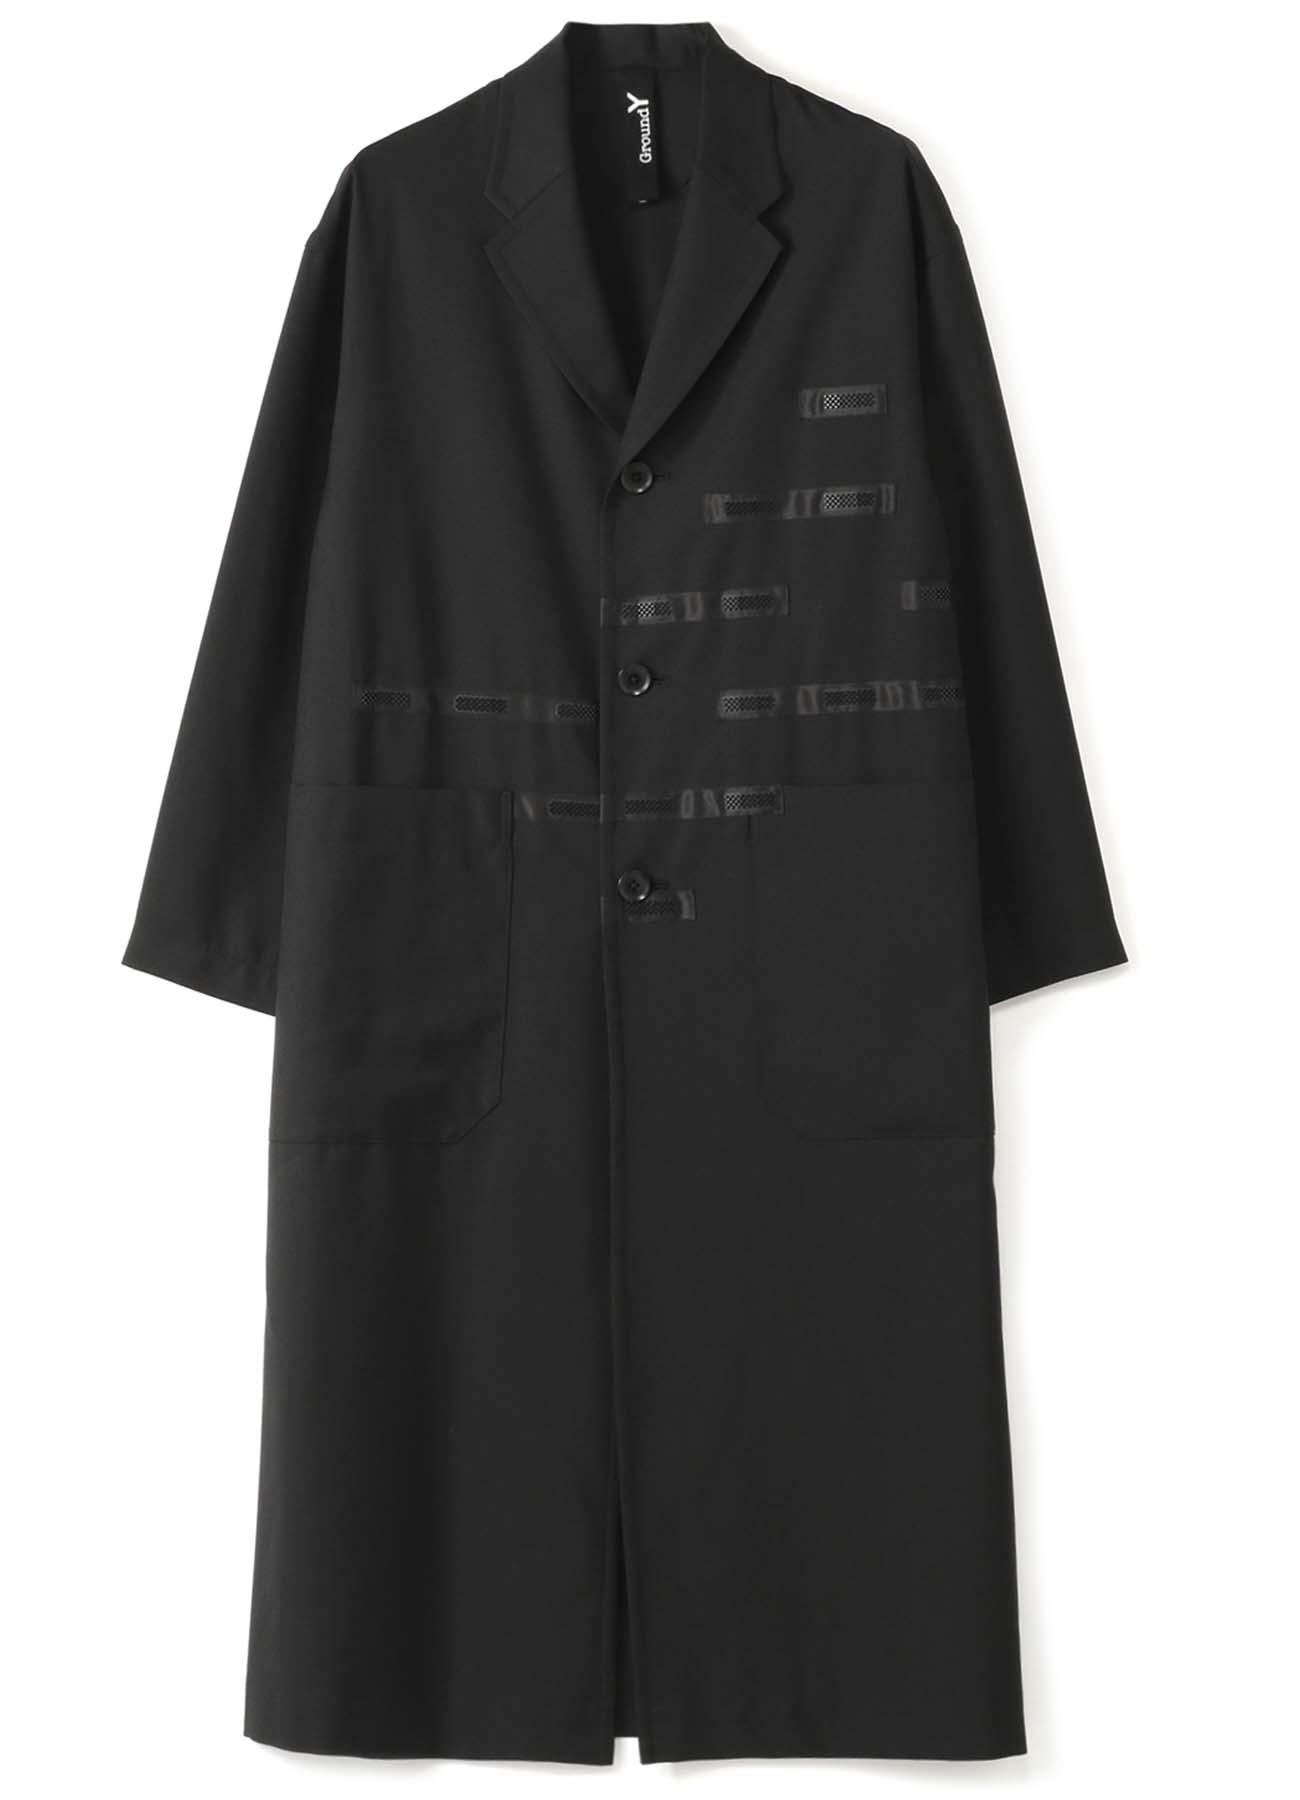 T/W Gabardine Back Tape Long Shirt Jacket